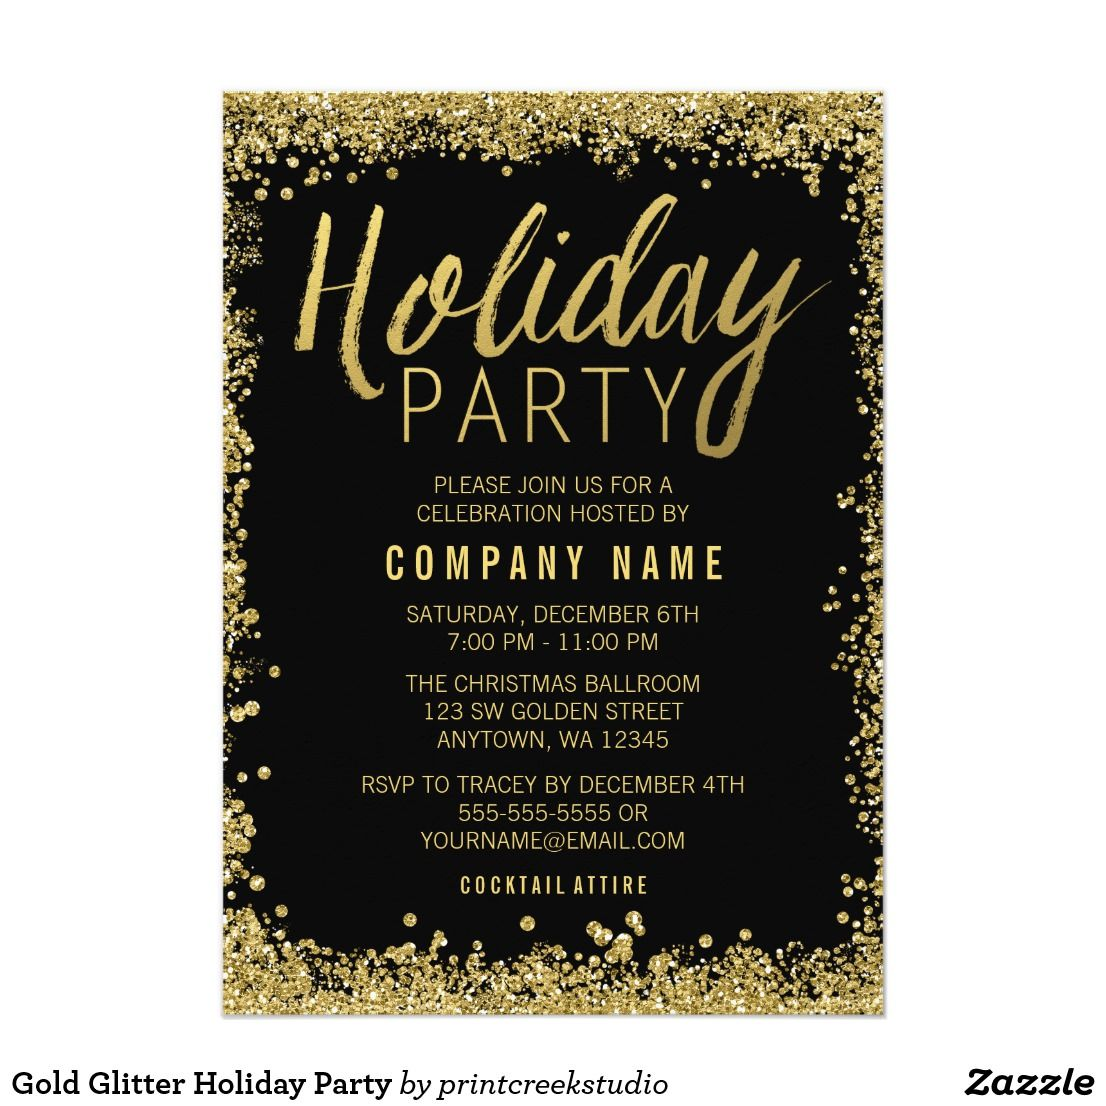 Gold Glitter Holiday Party Invitation Zazzle Com 21st Birthday